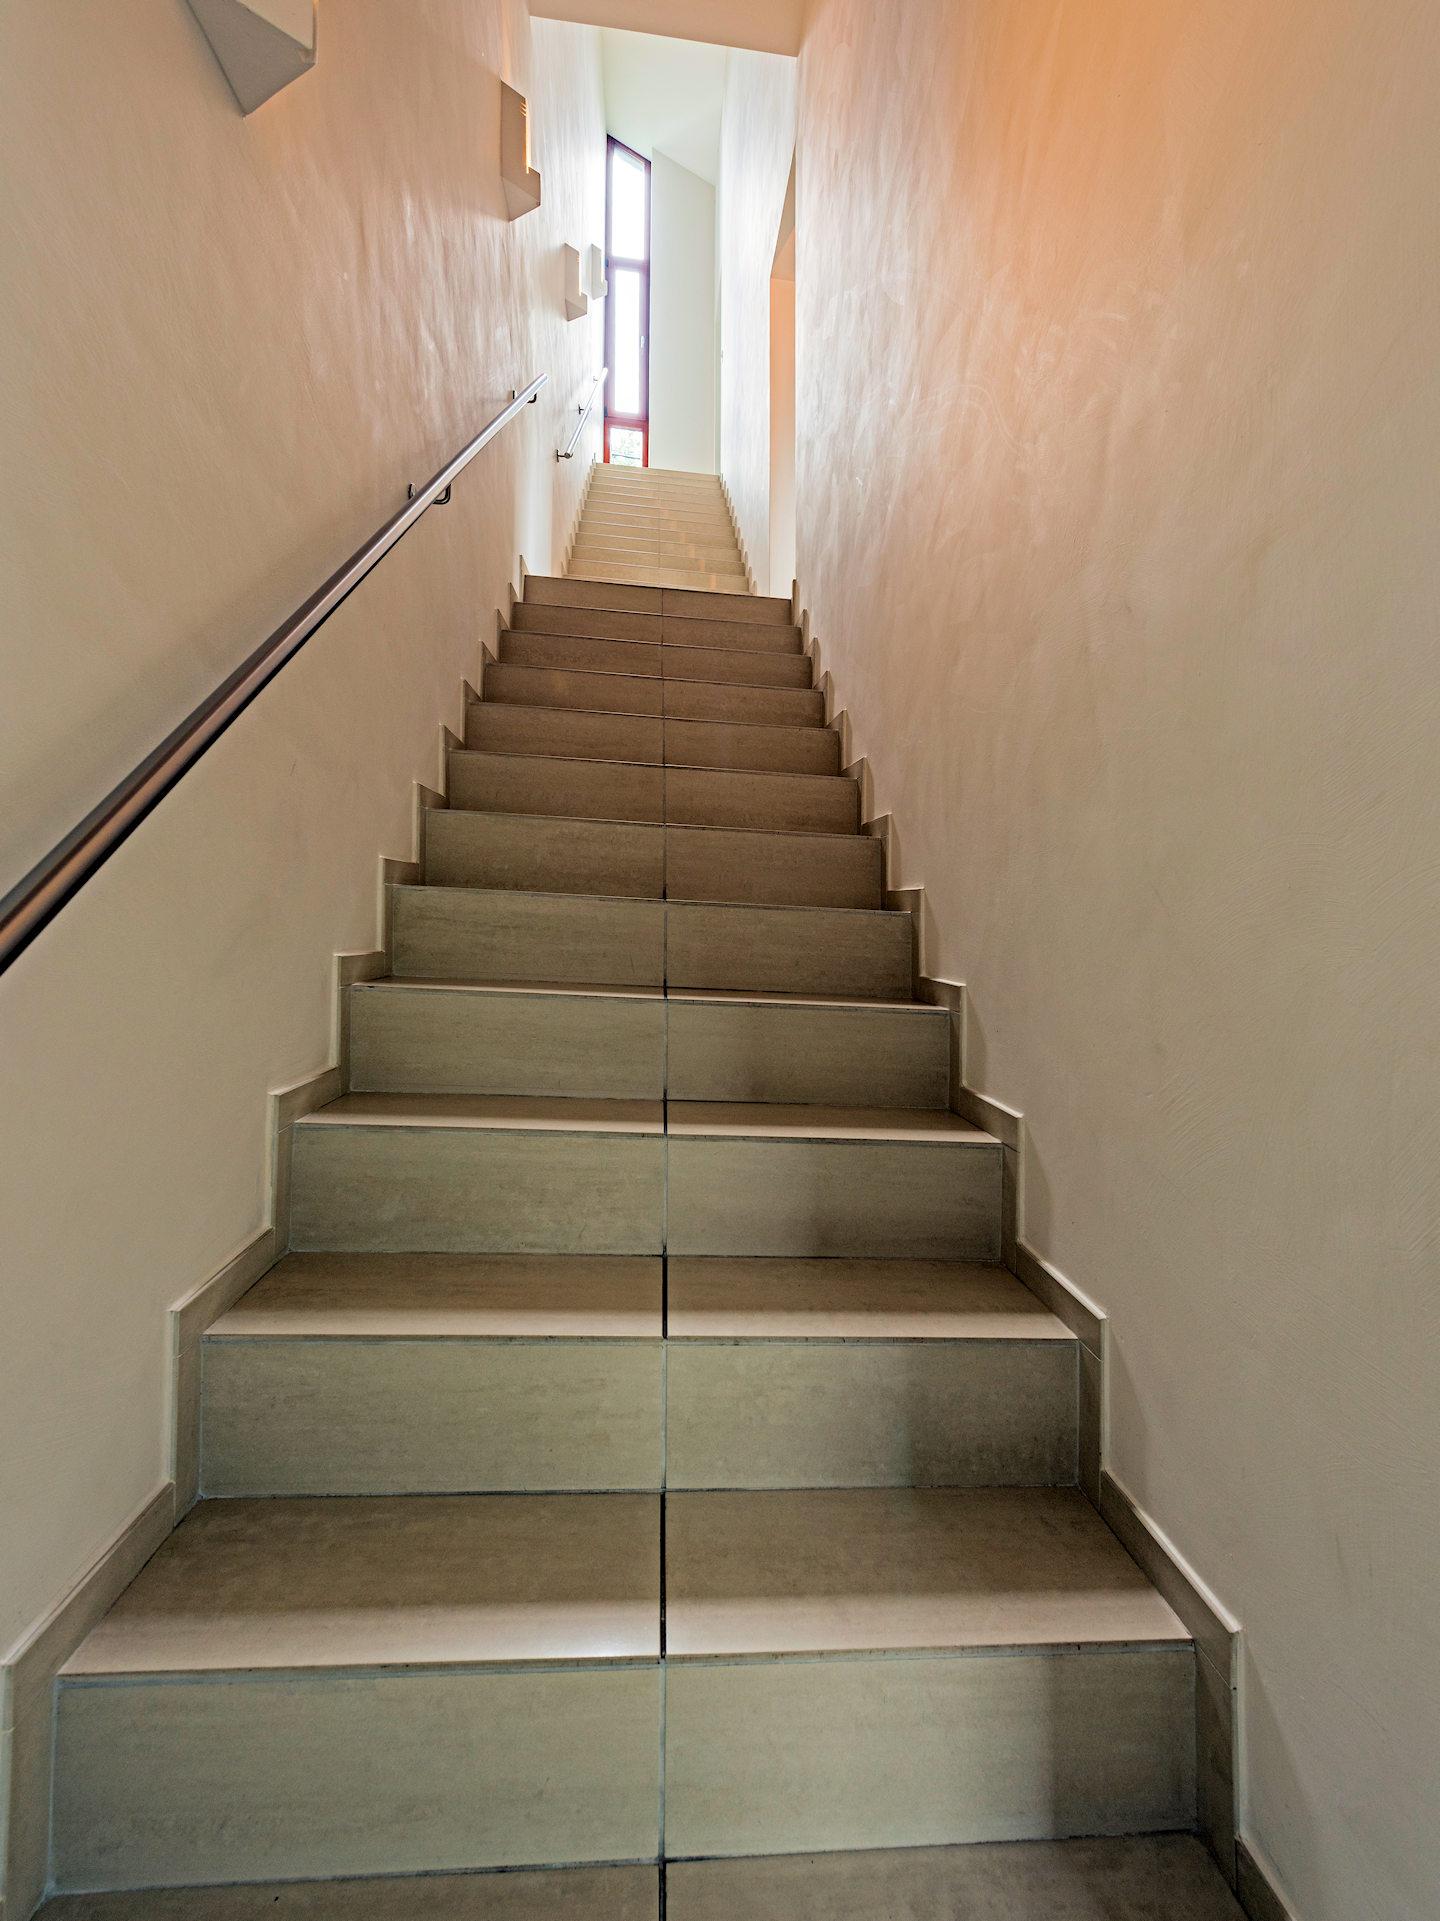 Falttreppe Fliesenbelag